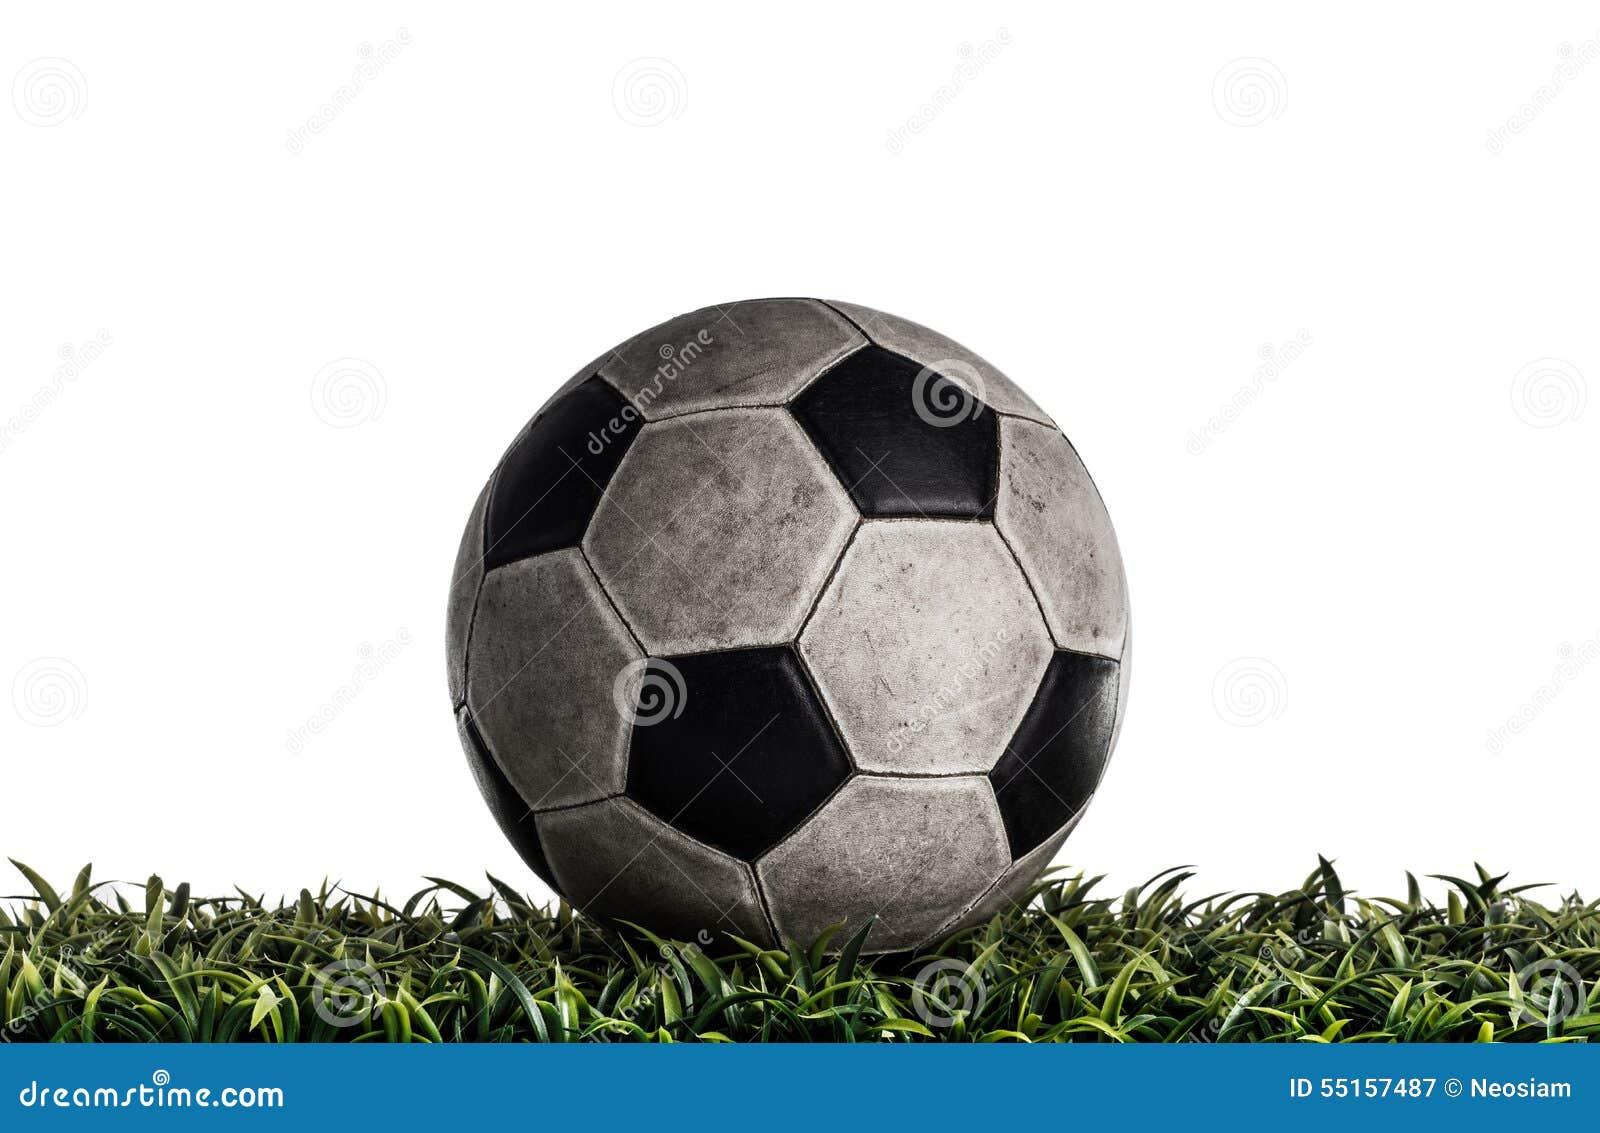 Old Soccer ball in the studio